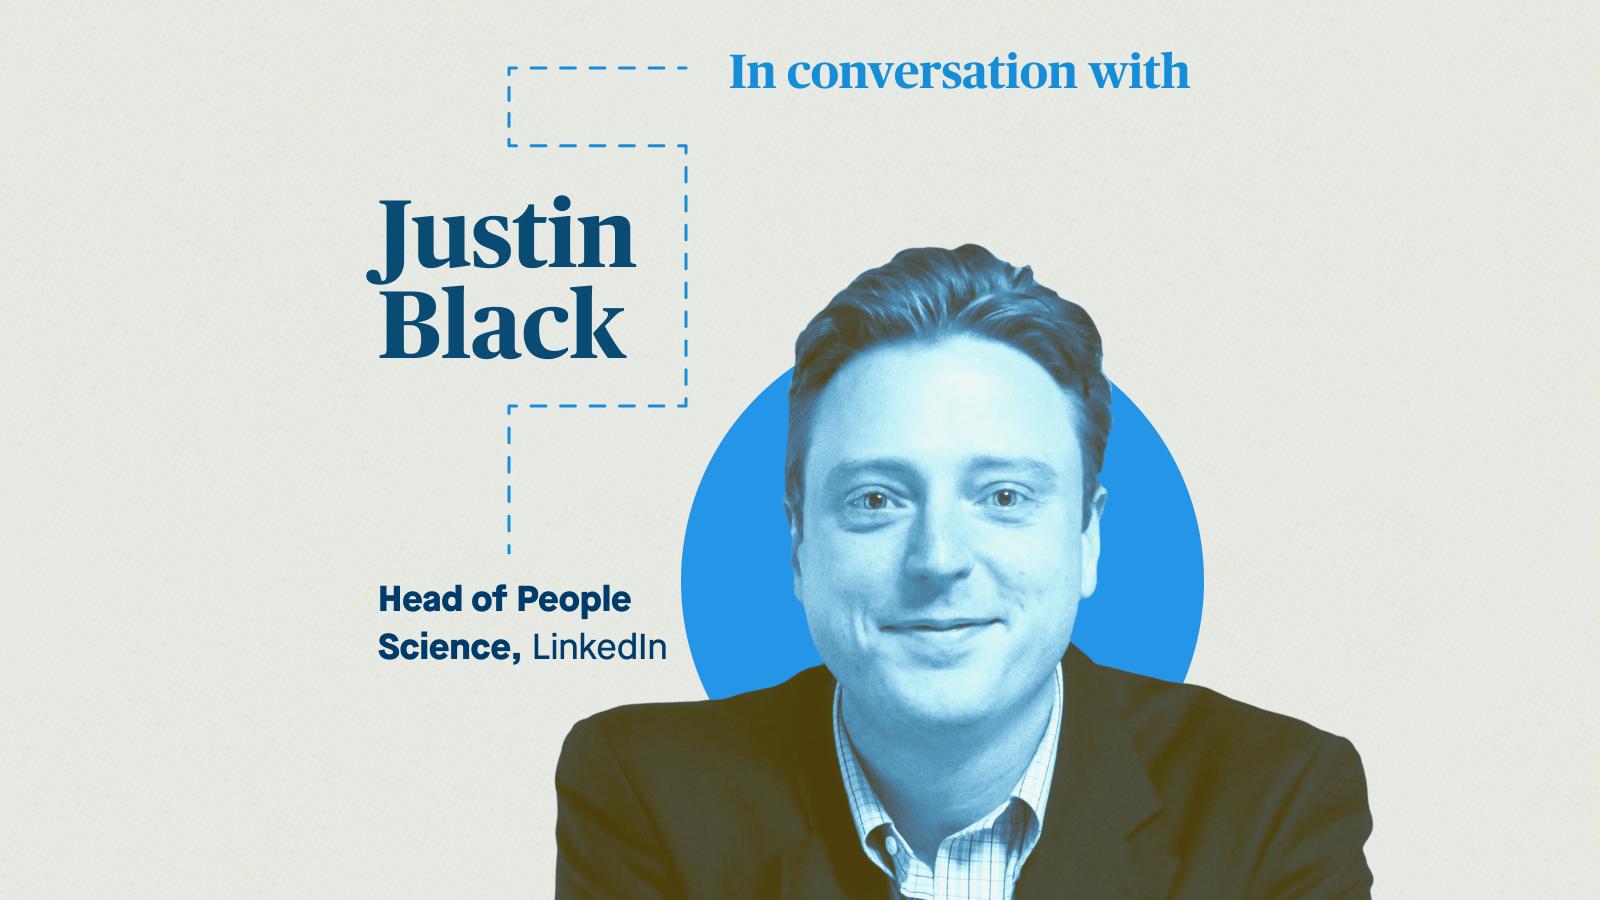 Justin Black, Head of People Science, LinkedIn